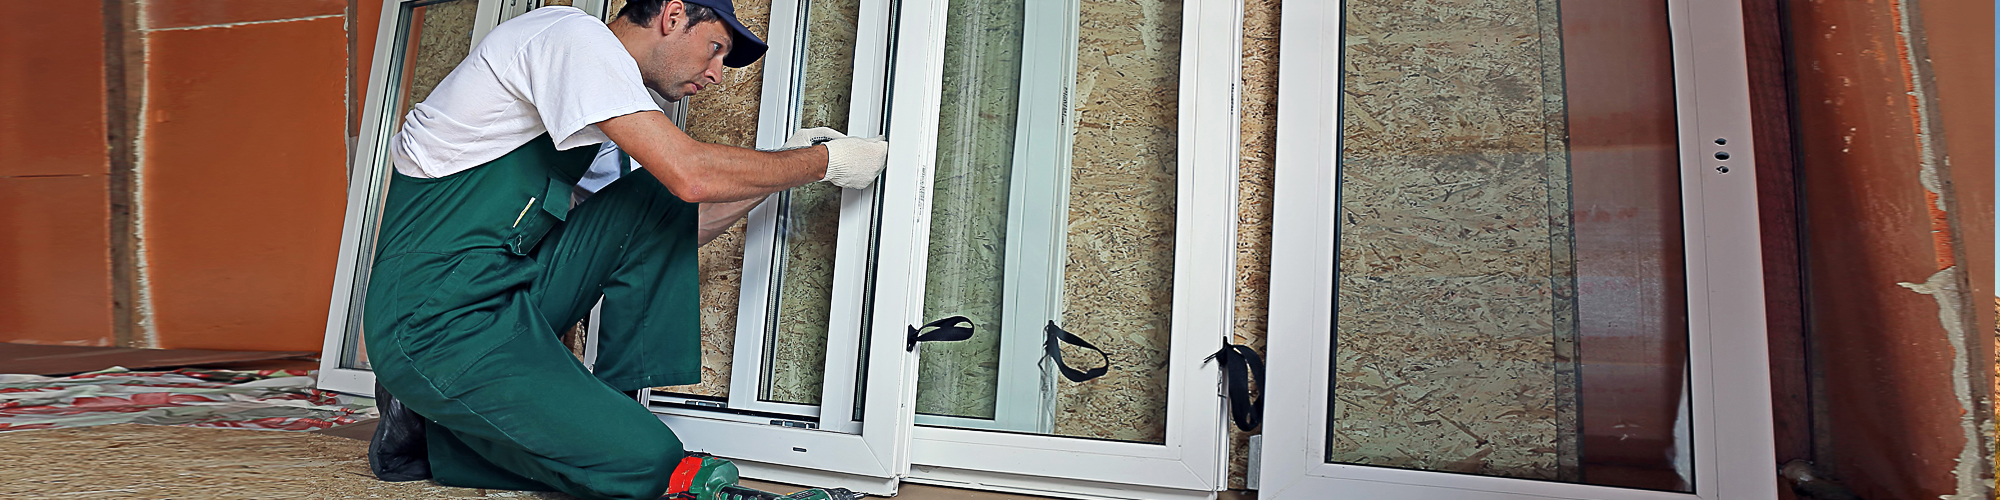 Window Service Window Parts Santa Fe Nm